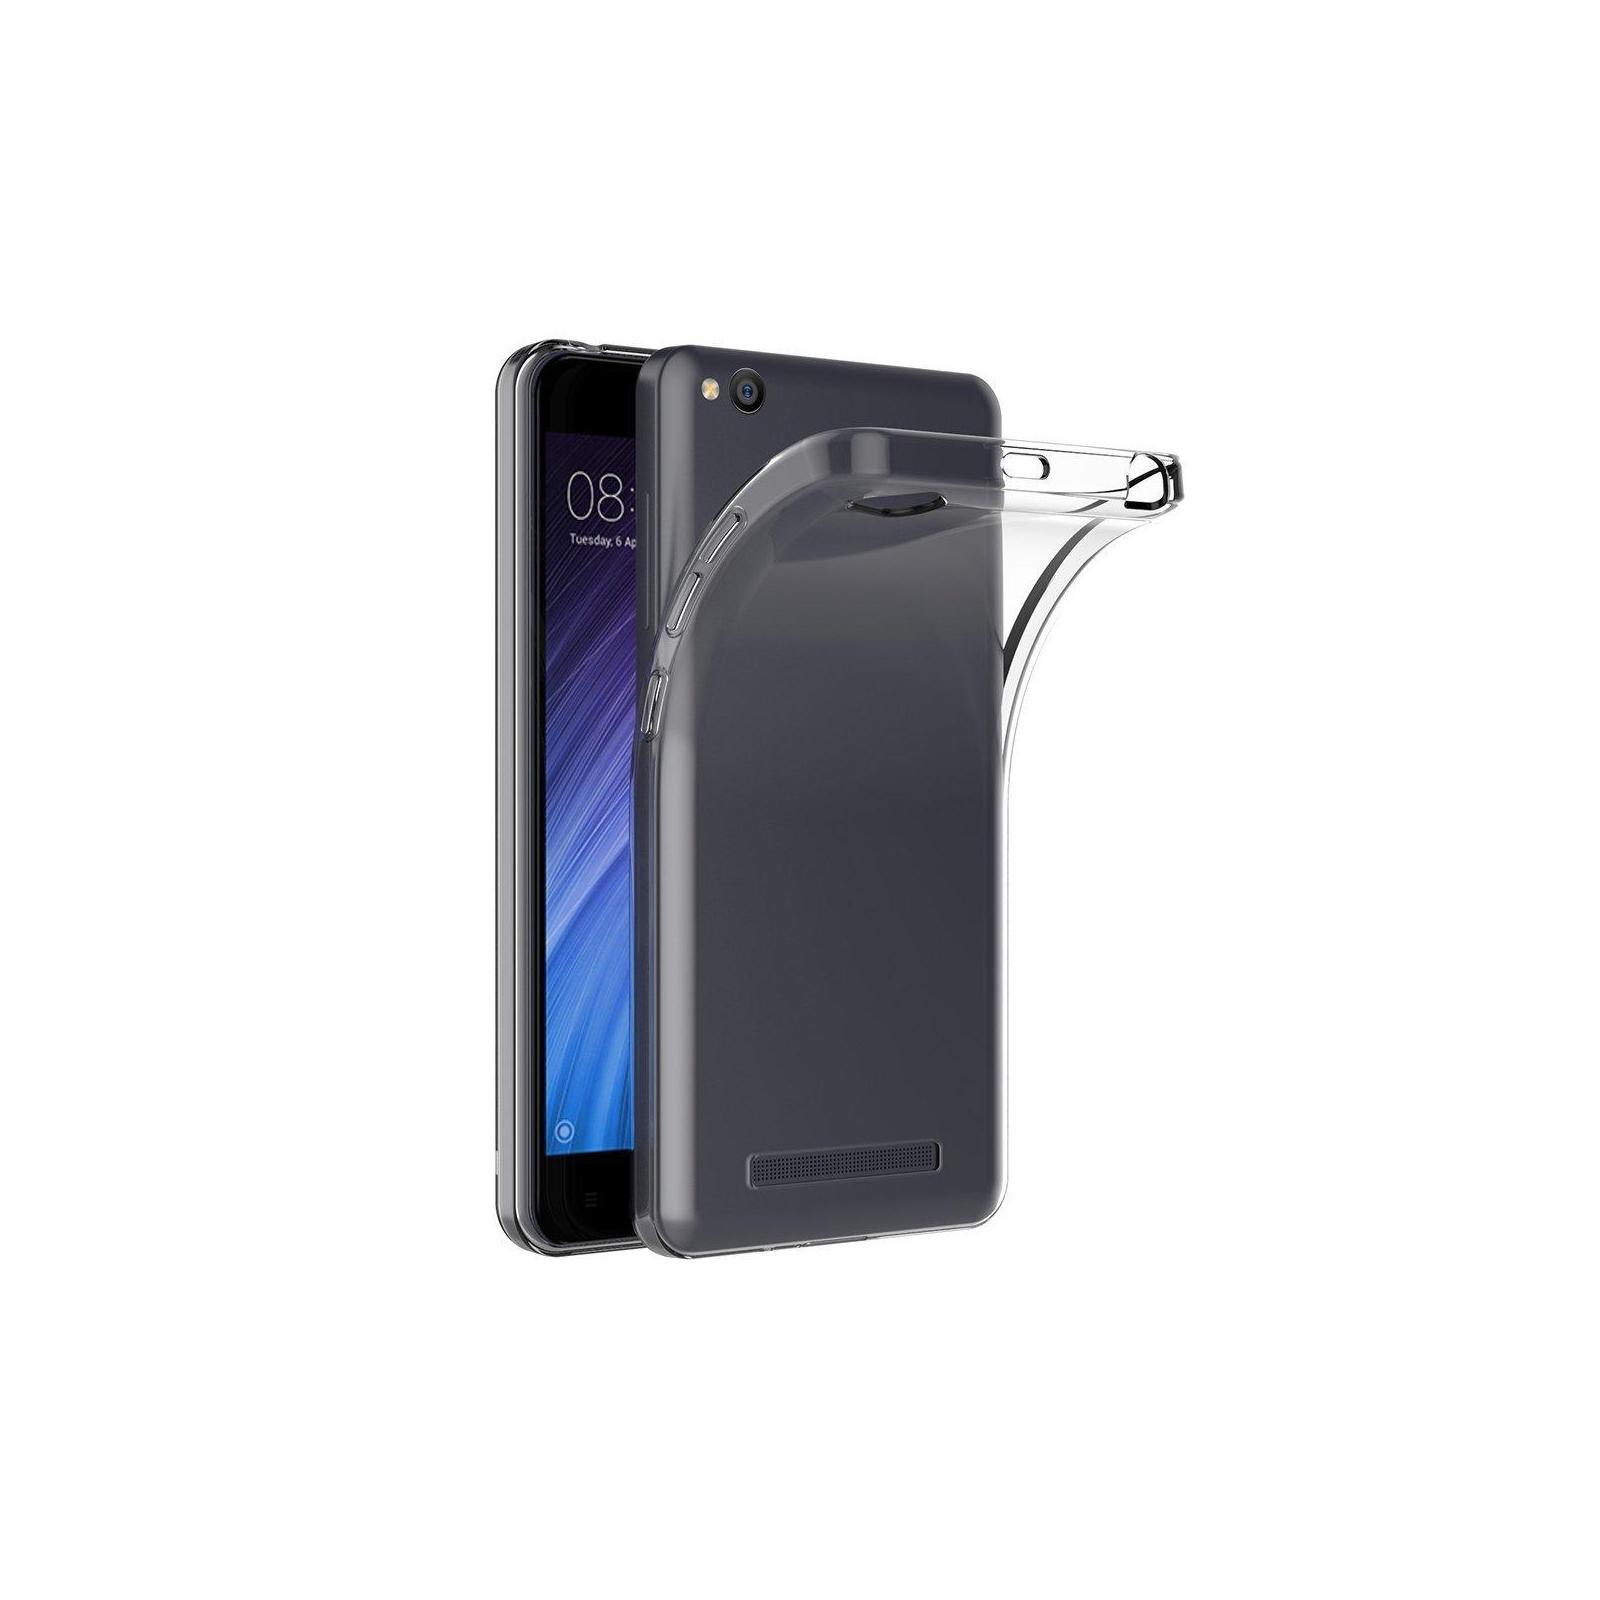 Чехол для моб. телефона Laudtec для Xiaomi Redmi 5A Clear tpu (Transperent) (LC-XR5A)